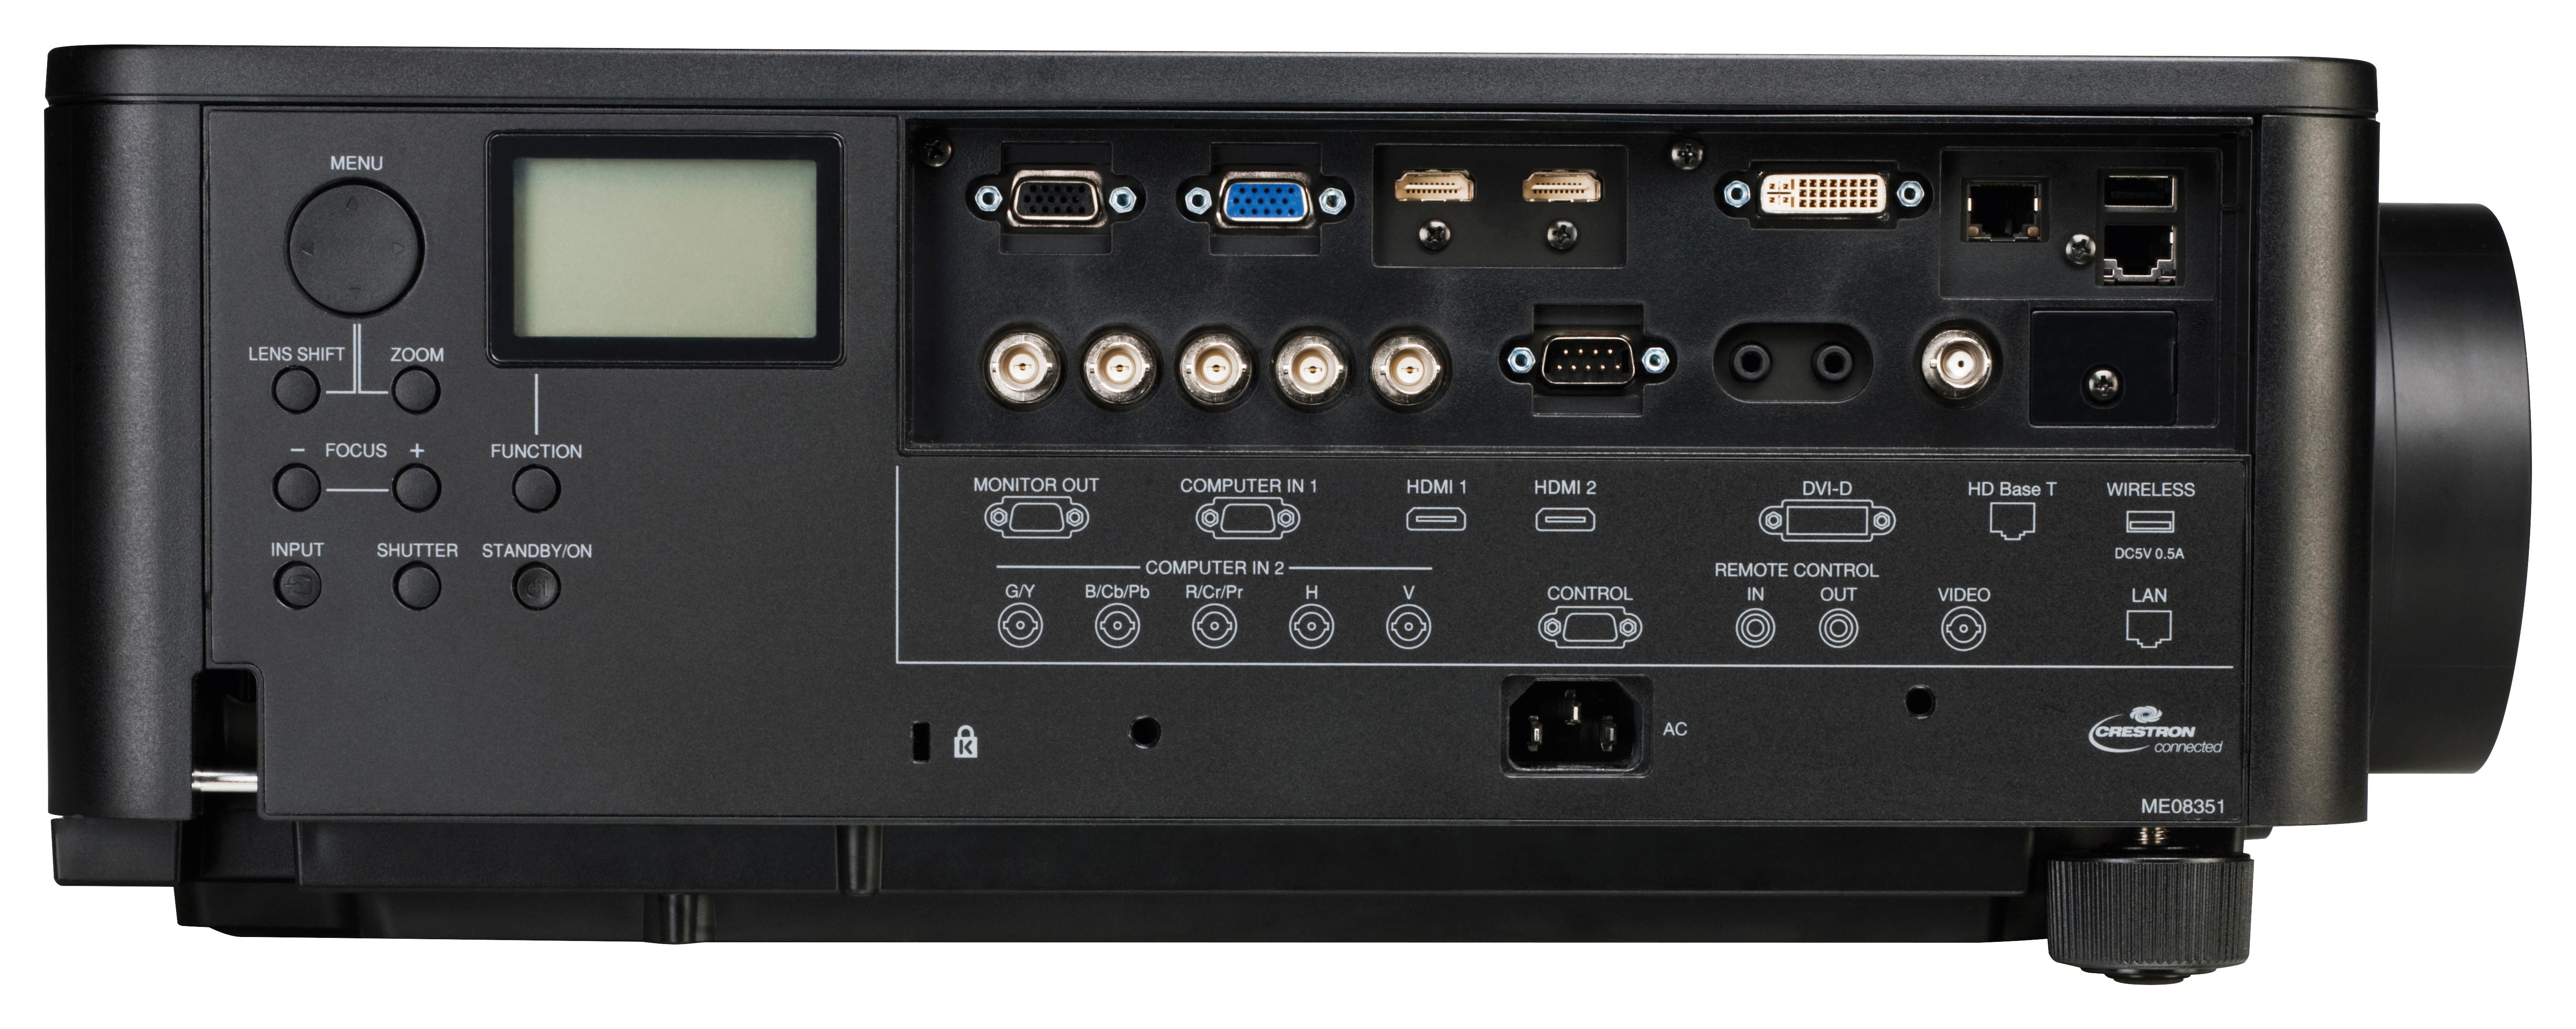 Hitachi Projektoren Cp Wx9210 Wxga Dlp Beamer X4041wn Wifi Projector Projektor